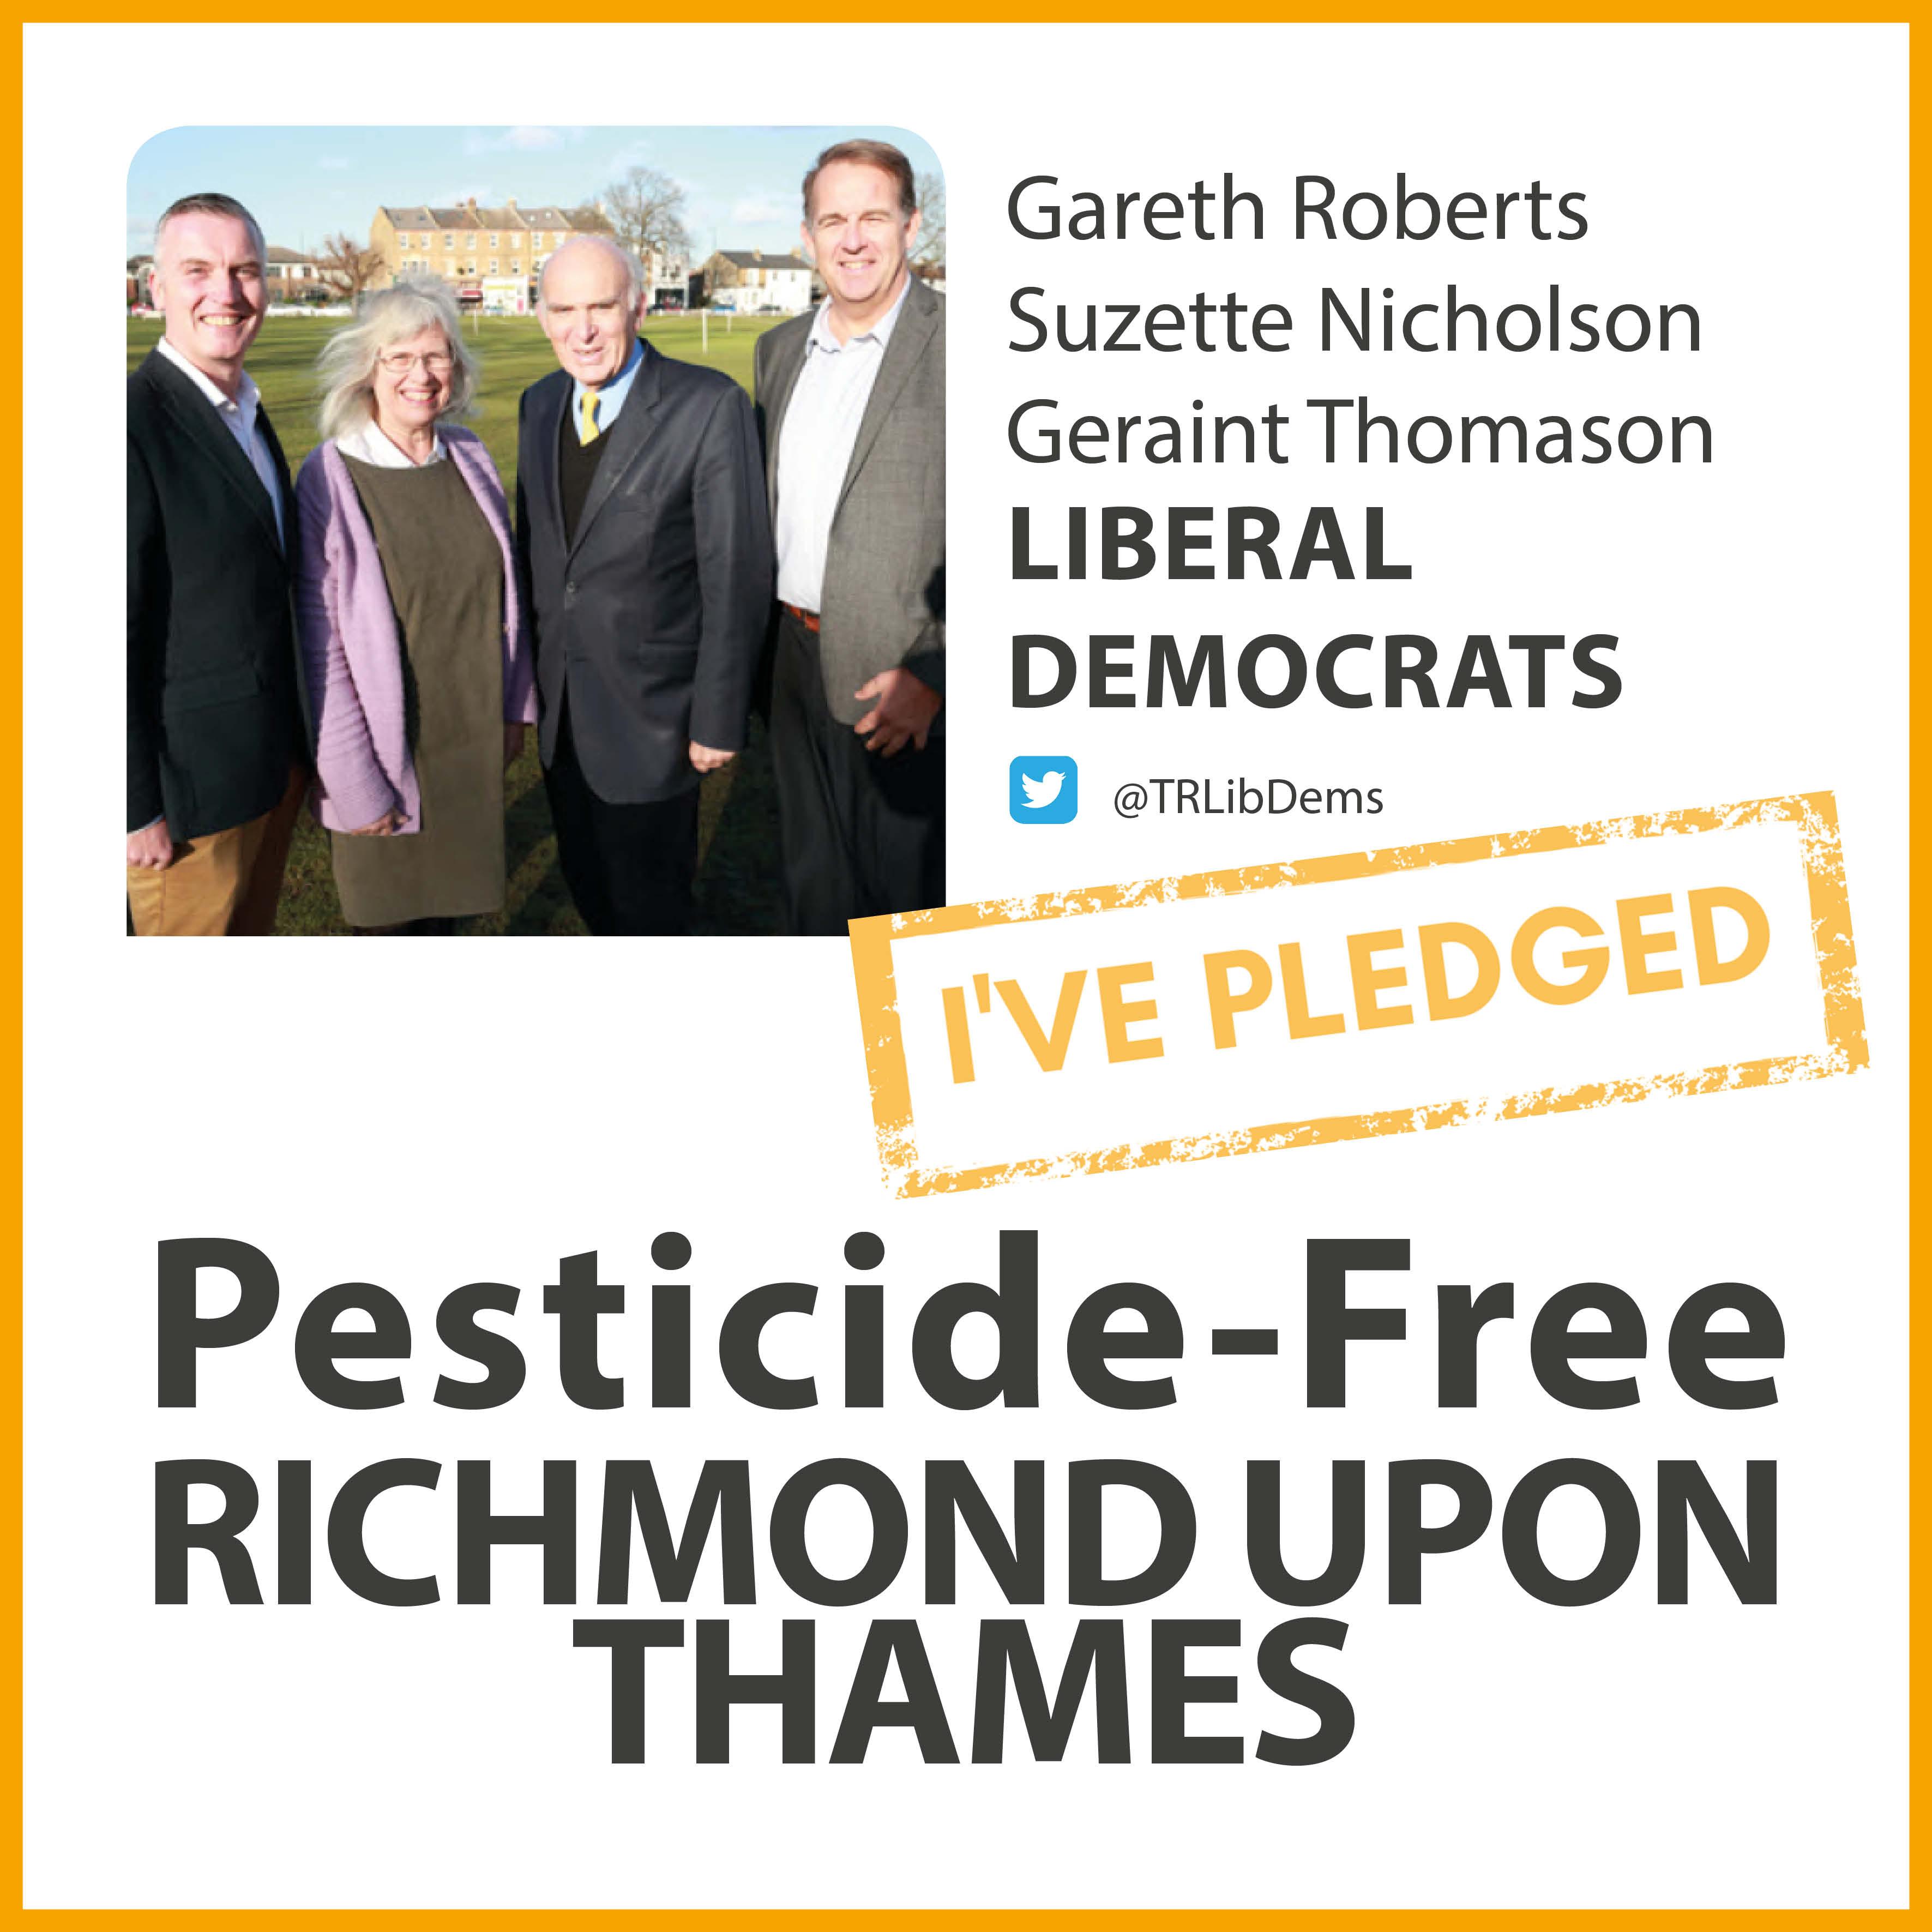 Hampton Lib Dems have taken the pesticide-free pledge